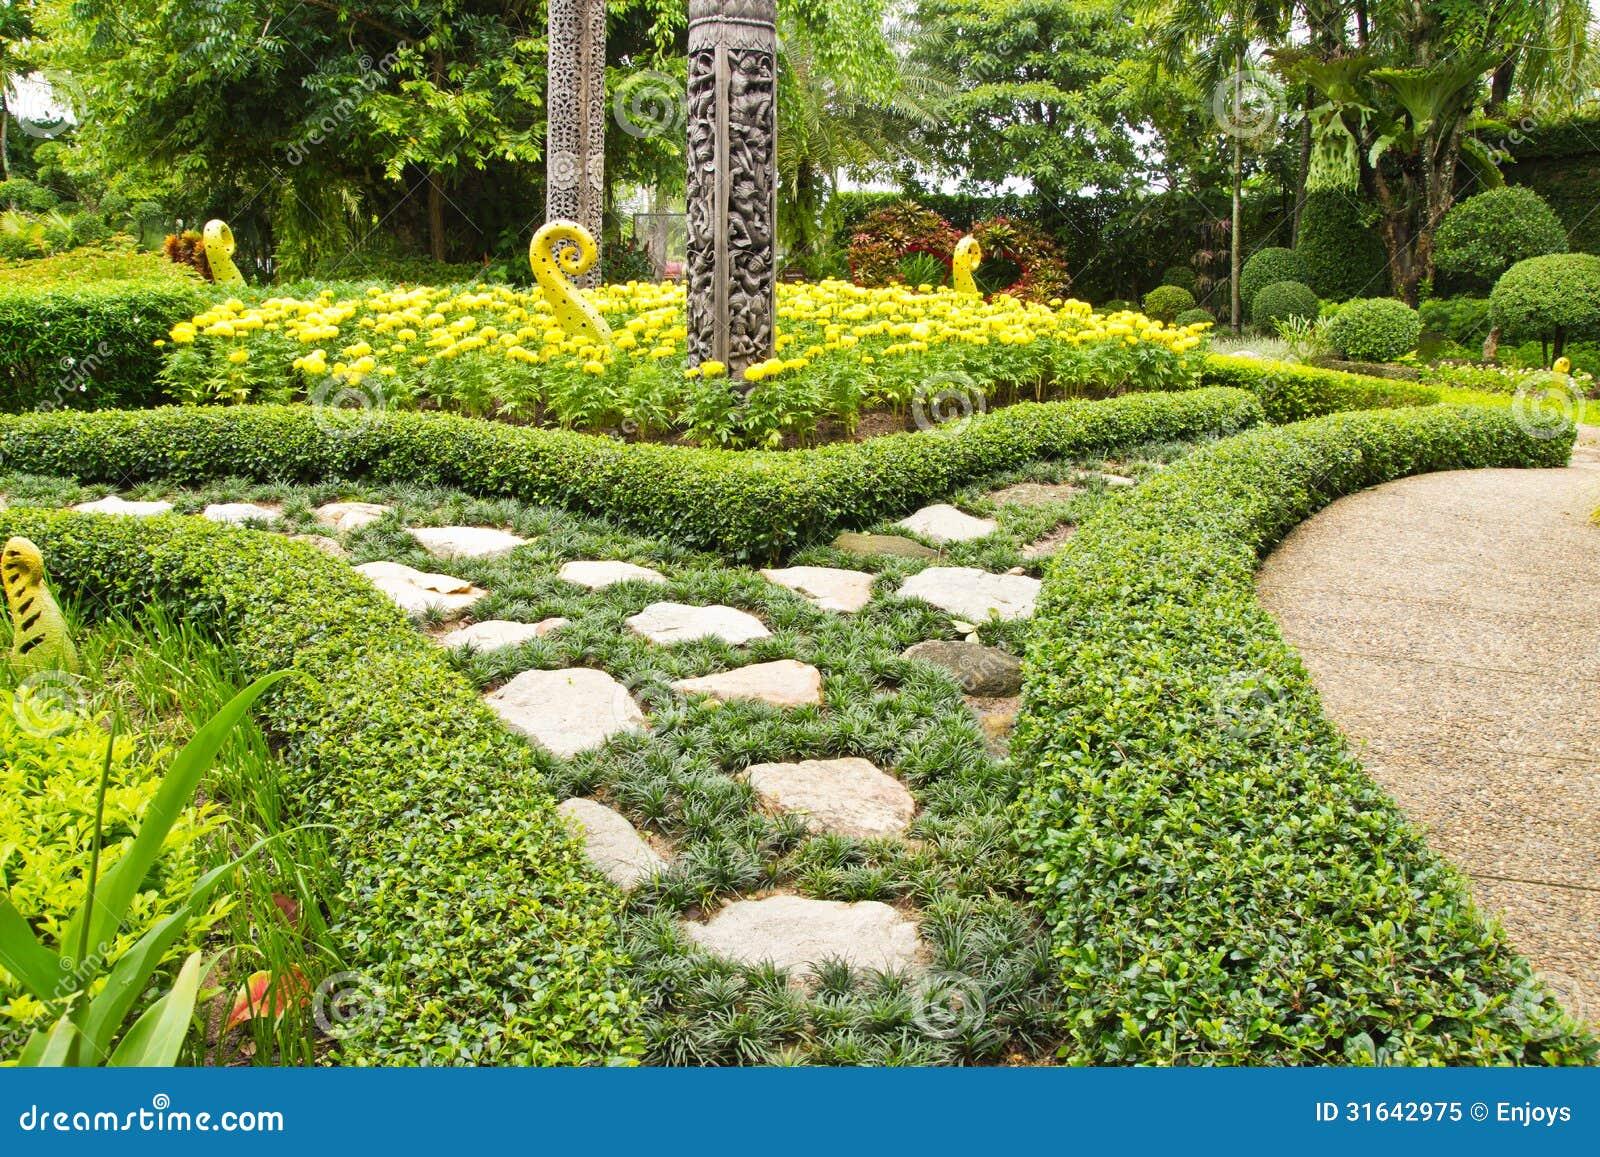 Topiary garden design art royalty free stock photo for Topiary garden designs